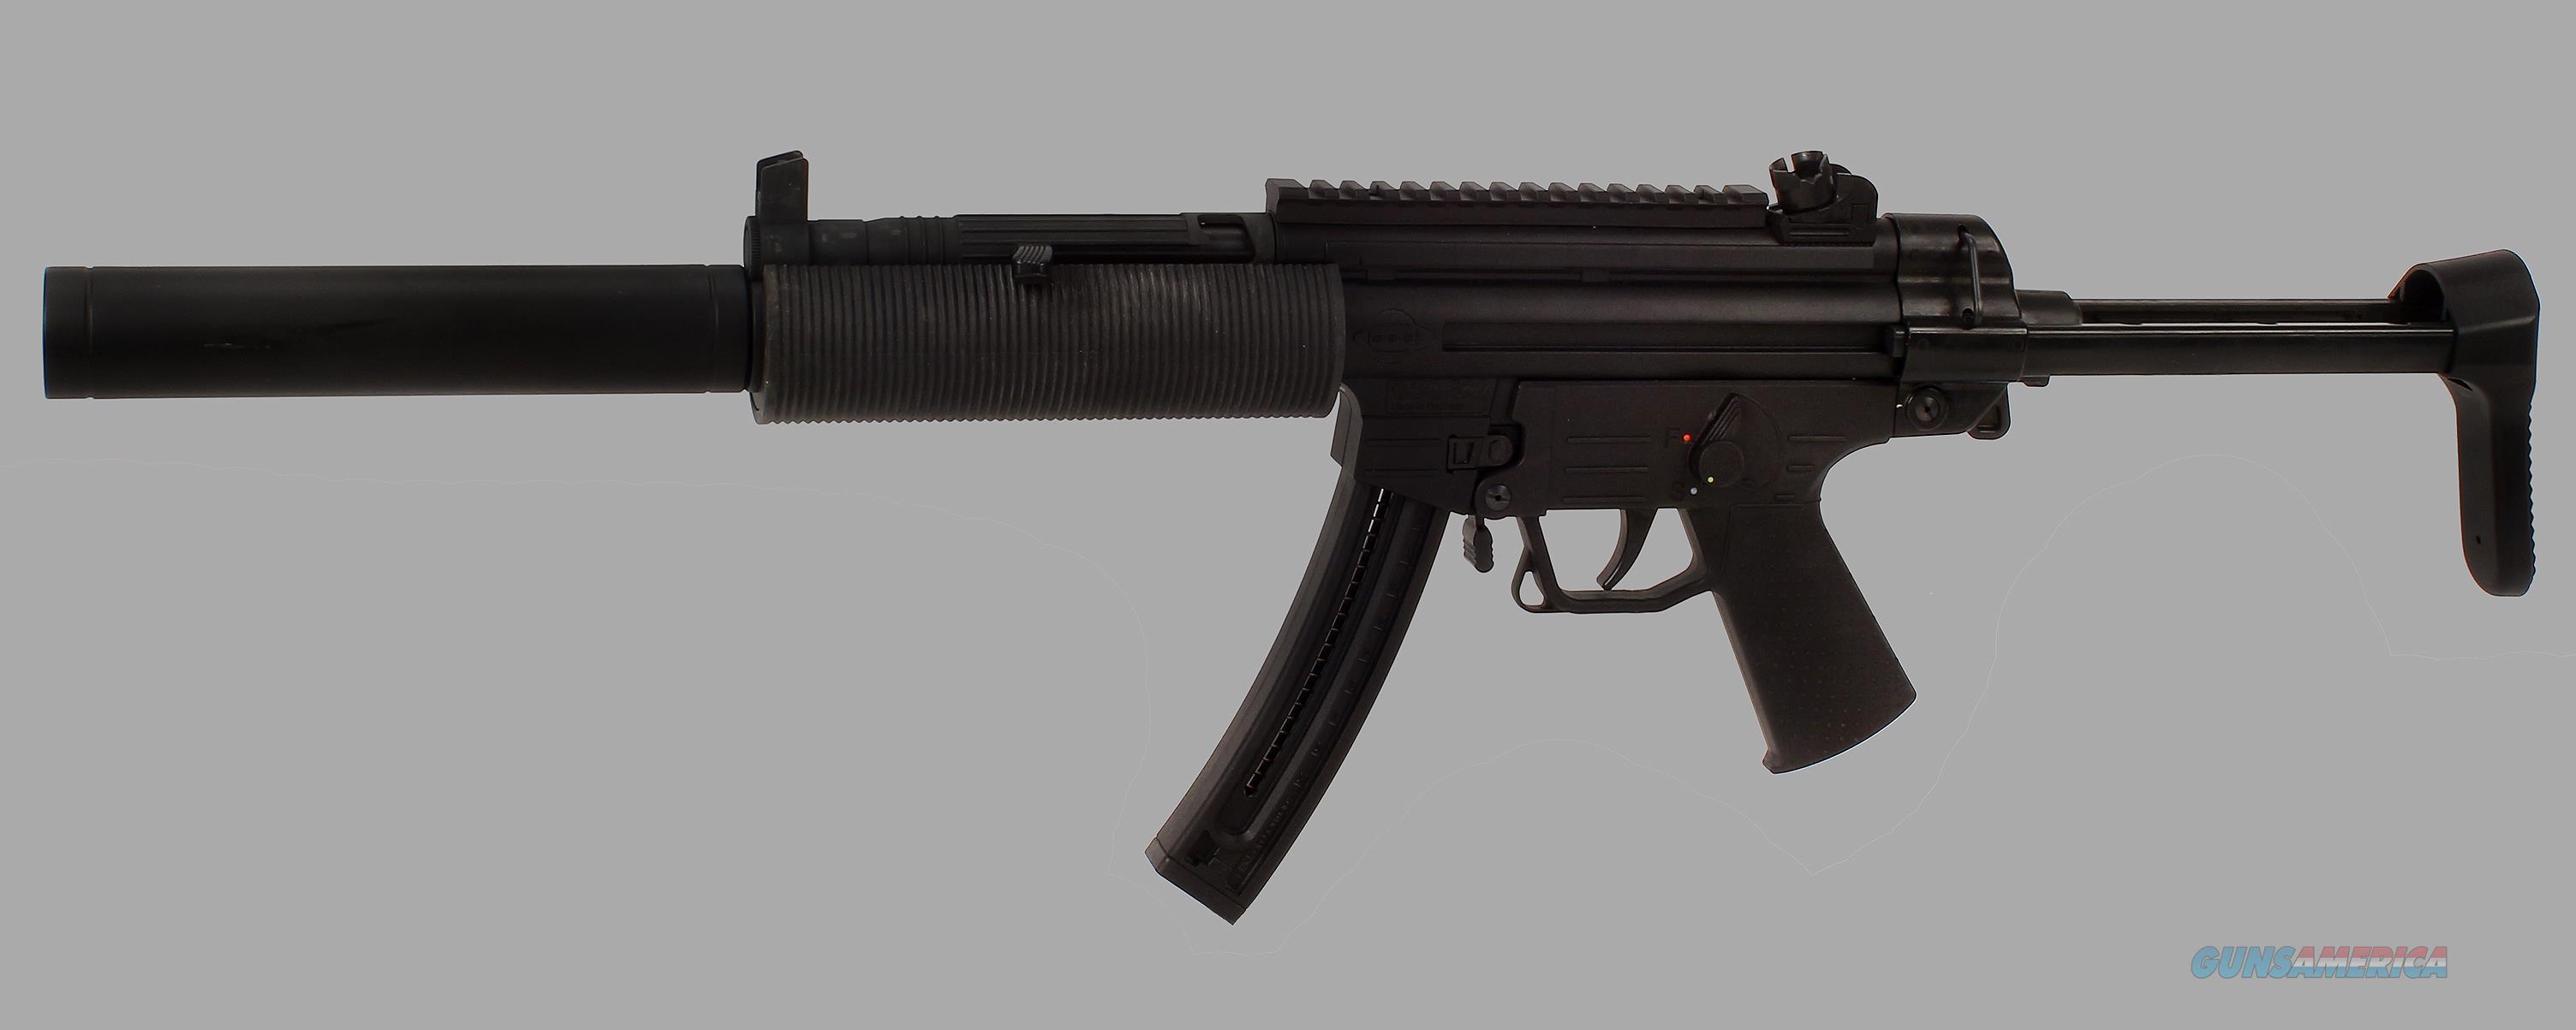 American Tactical 22LR GSG-522 Semi Auto Rifle